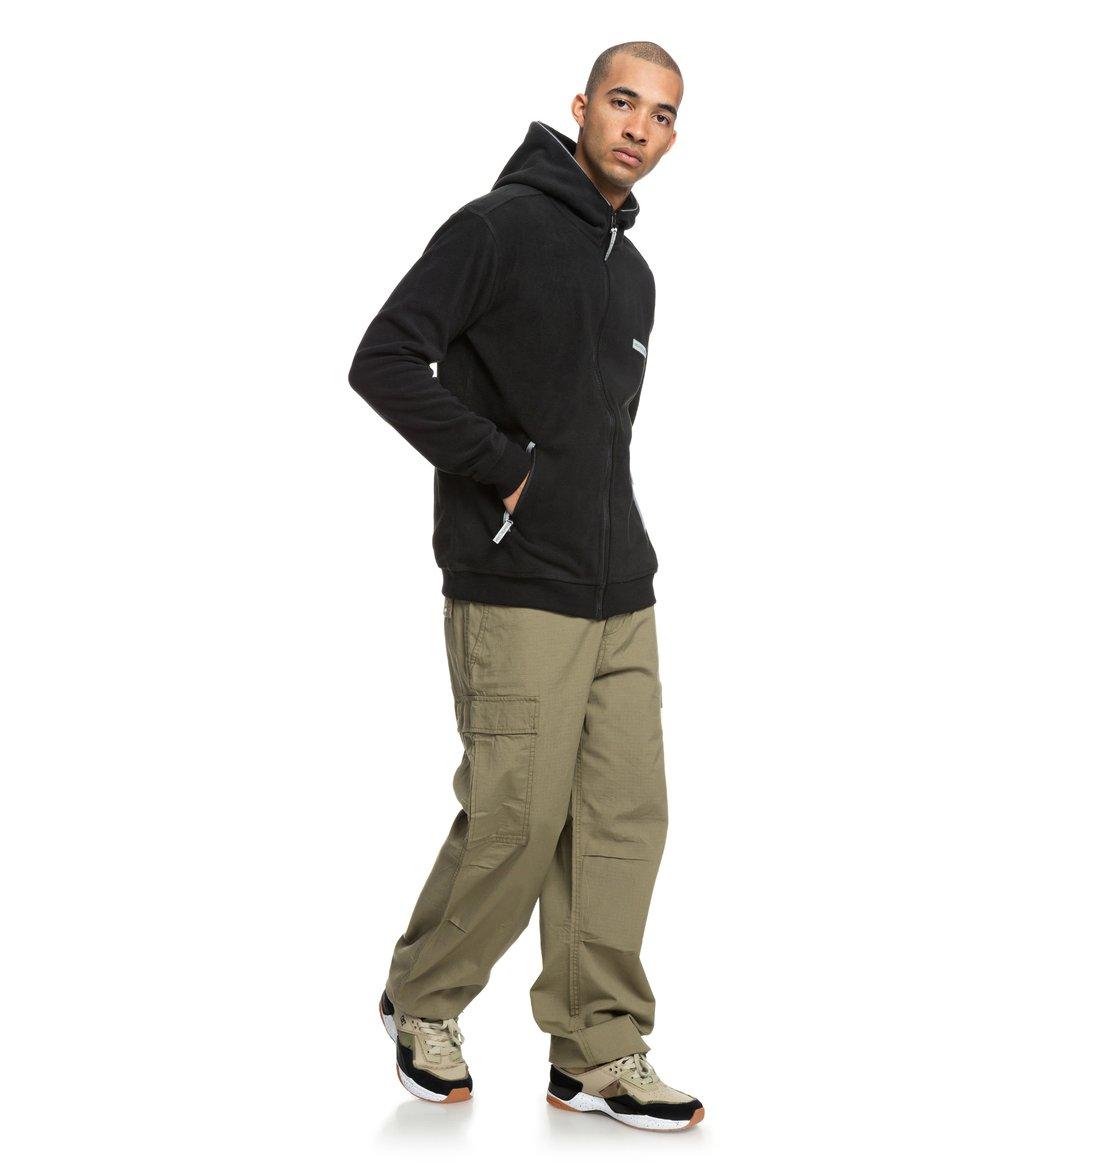 DC-Shoes-Beckerley-Zip-Up-Hoodie-for-Men-Maenner